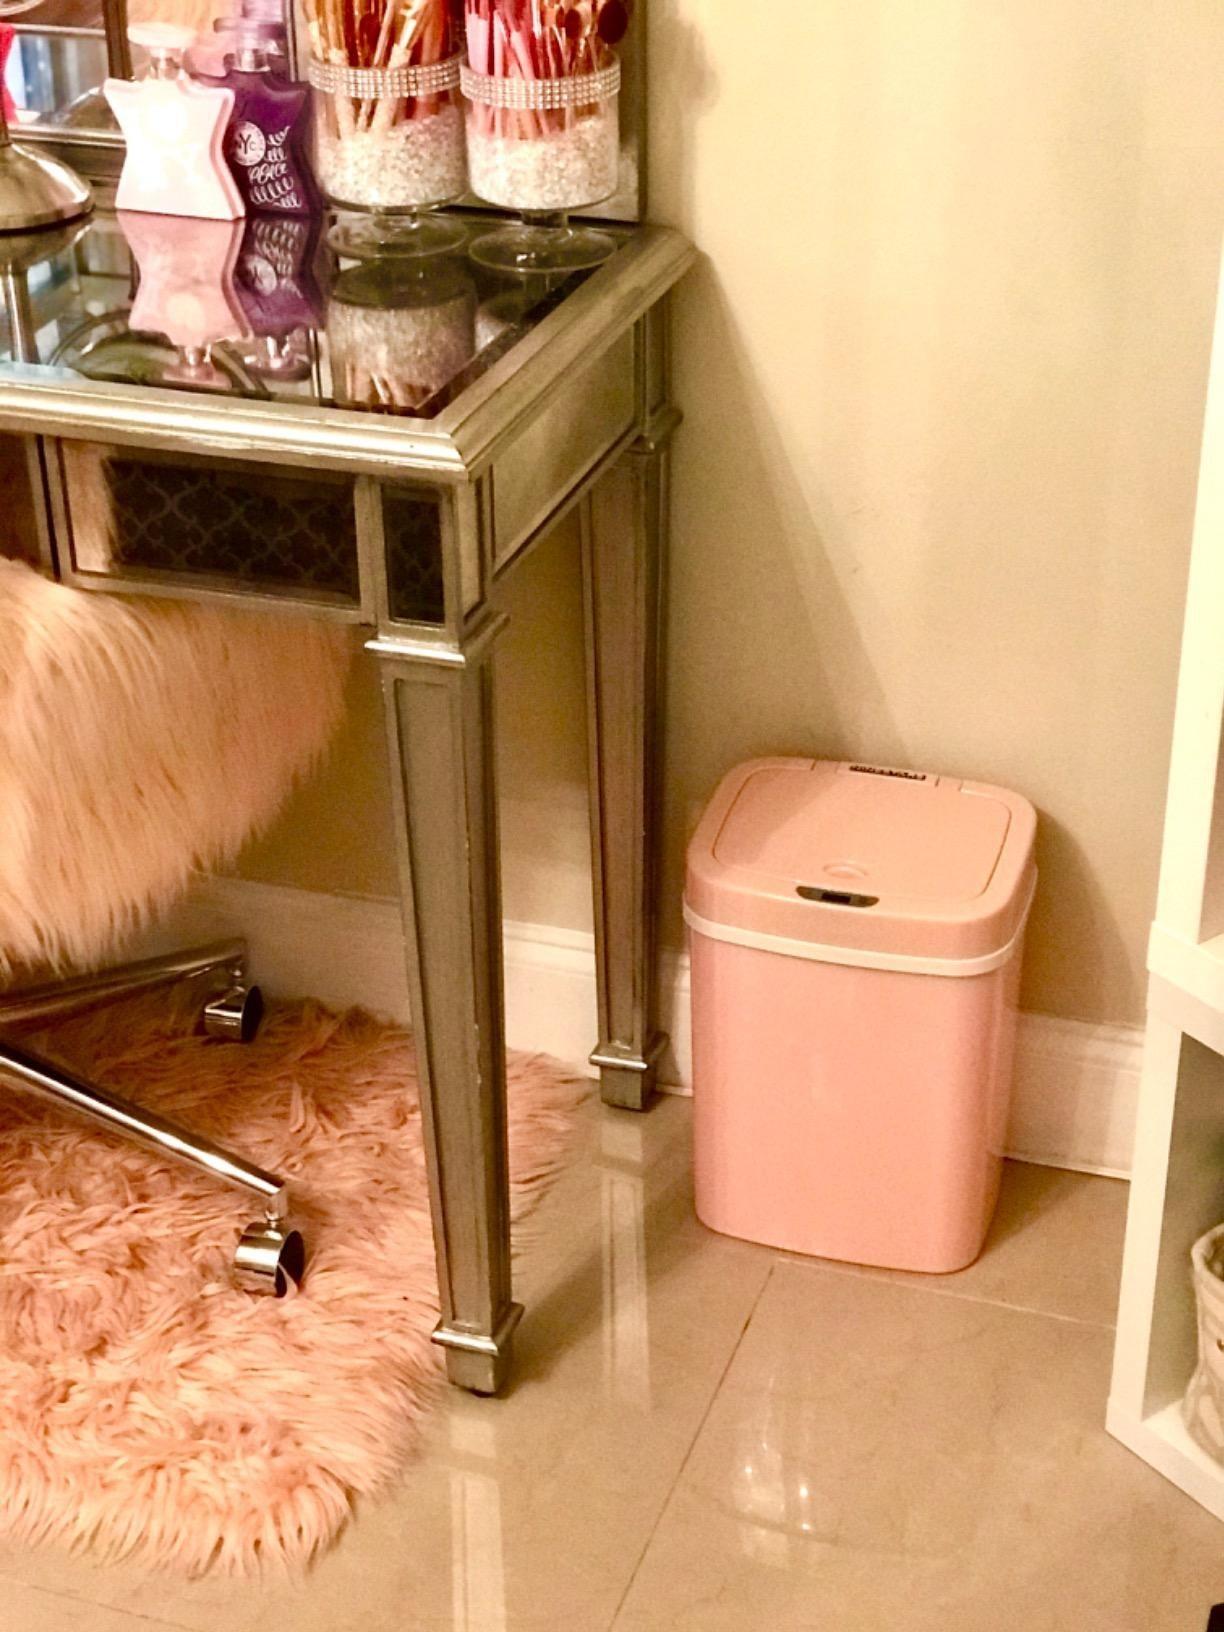 Reviewer trash bin next to desk in room